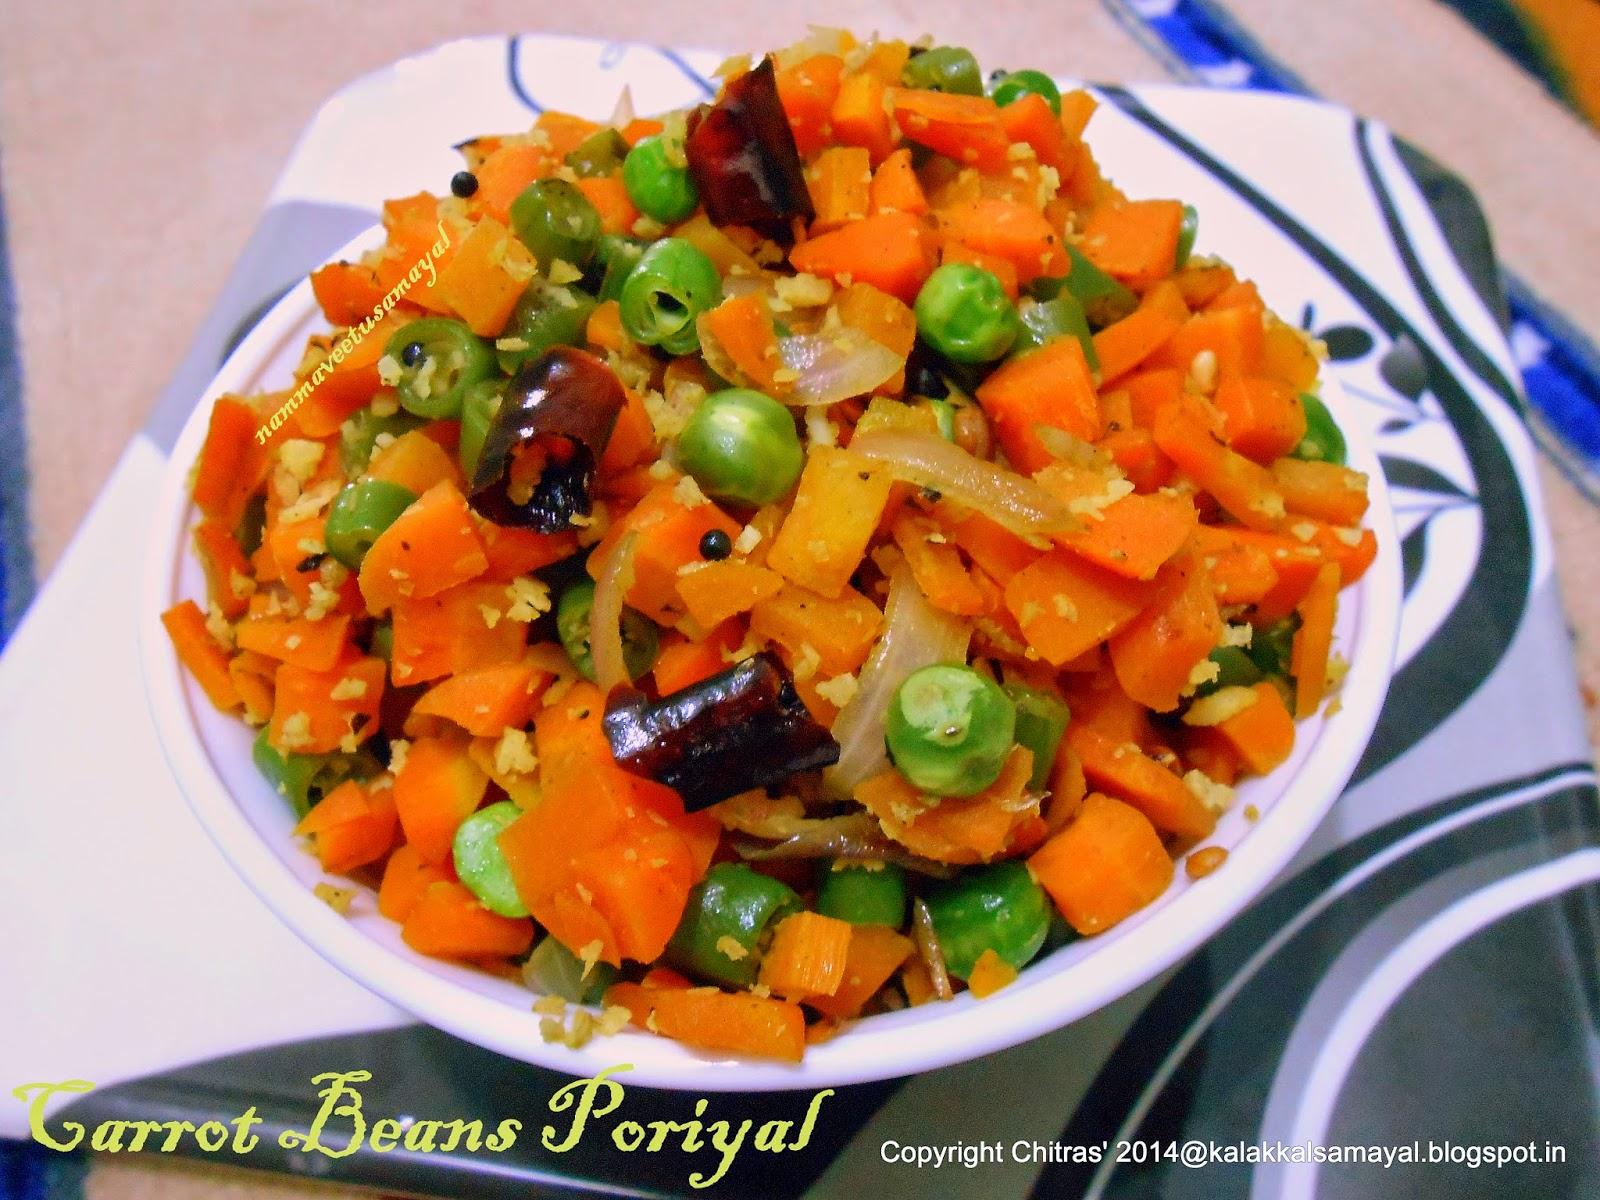 Carrot beans Poriyal [ Carrot beans Stir Fry ]